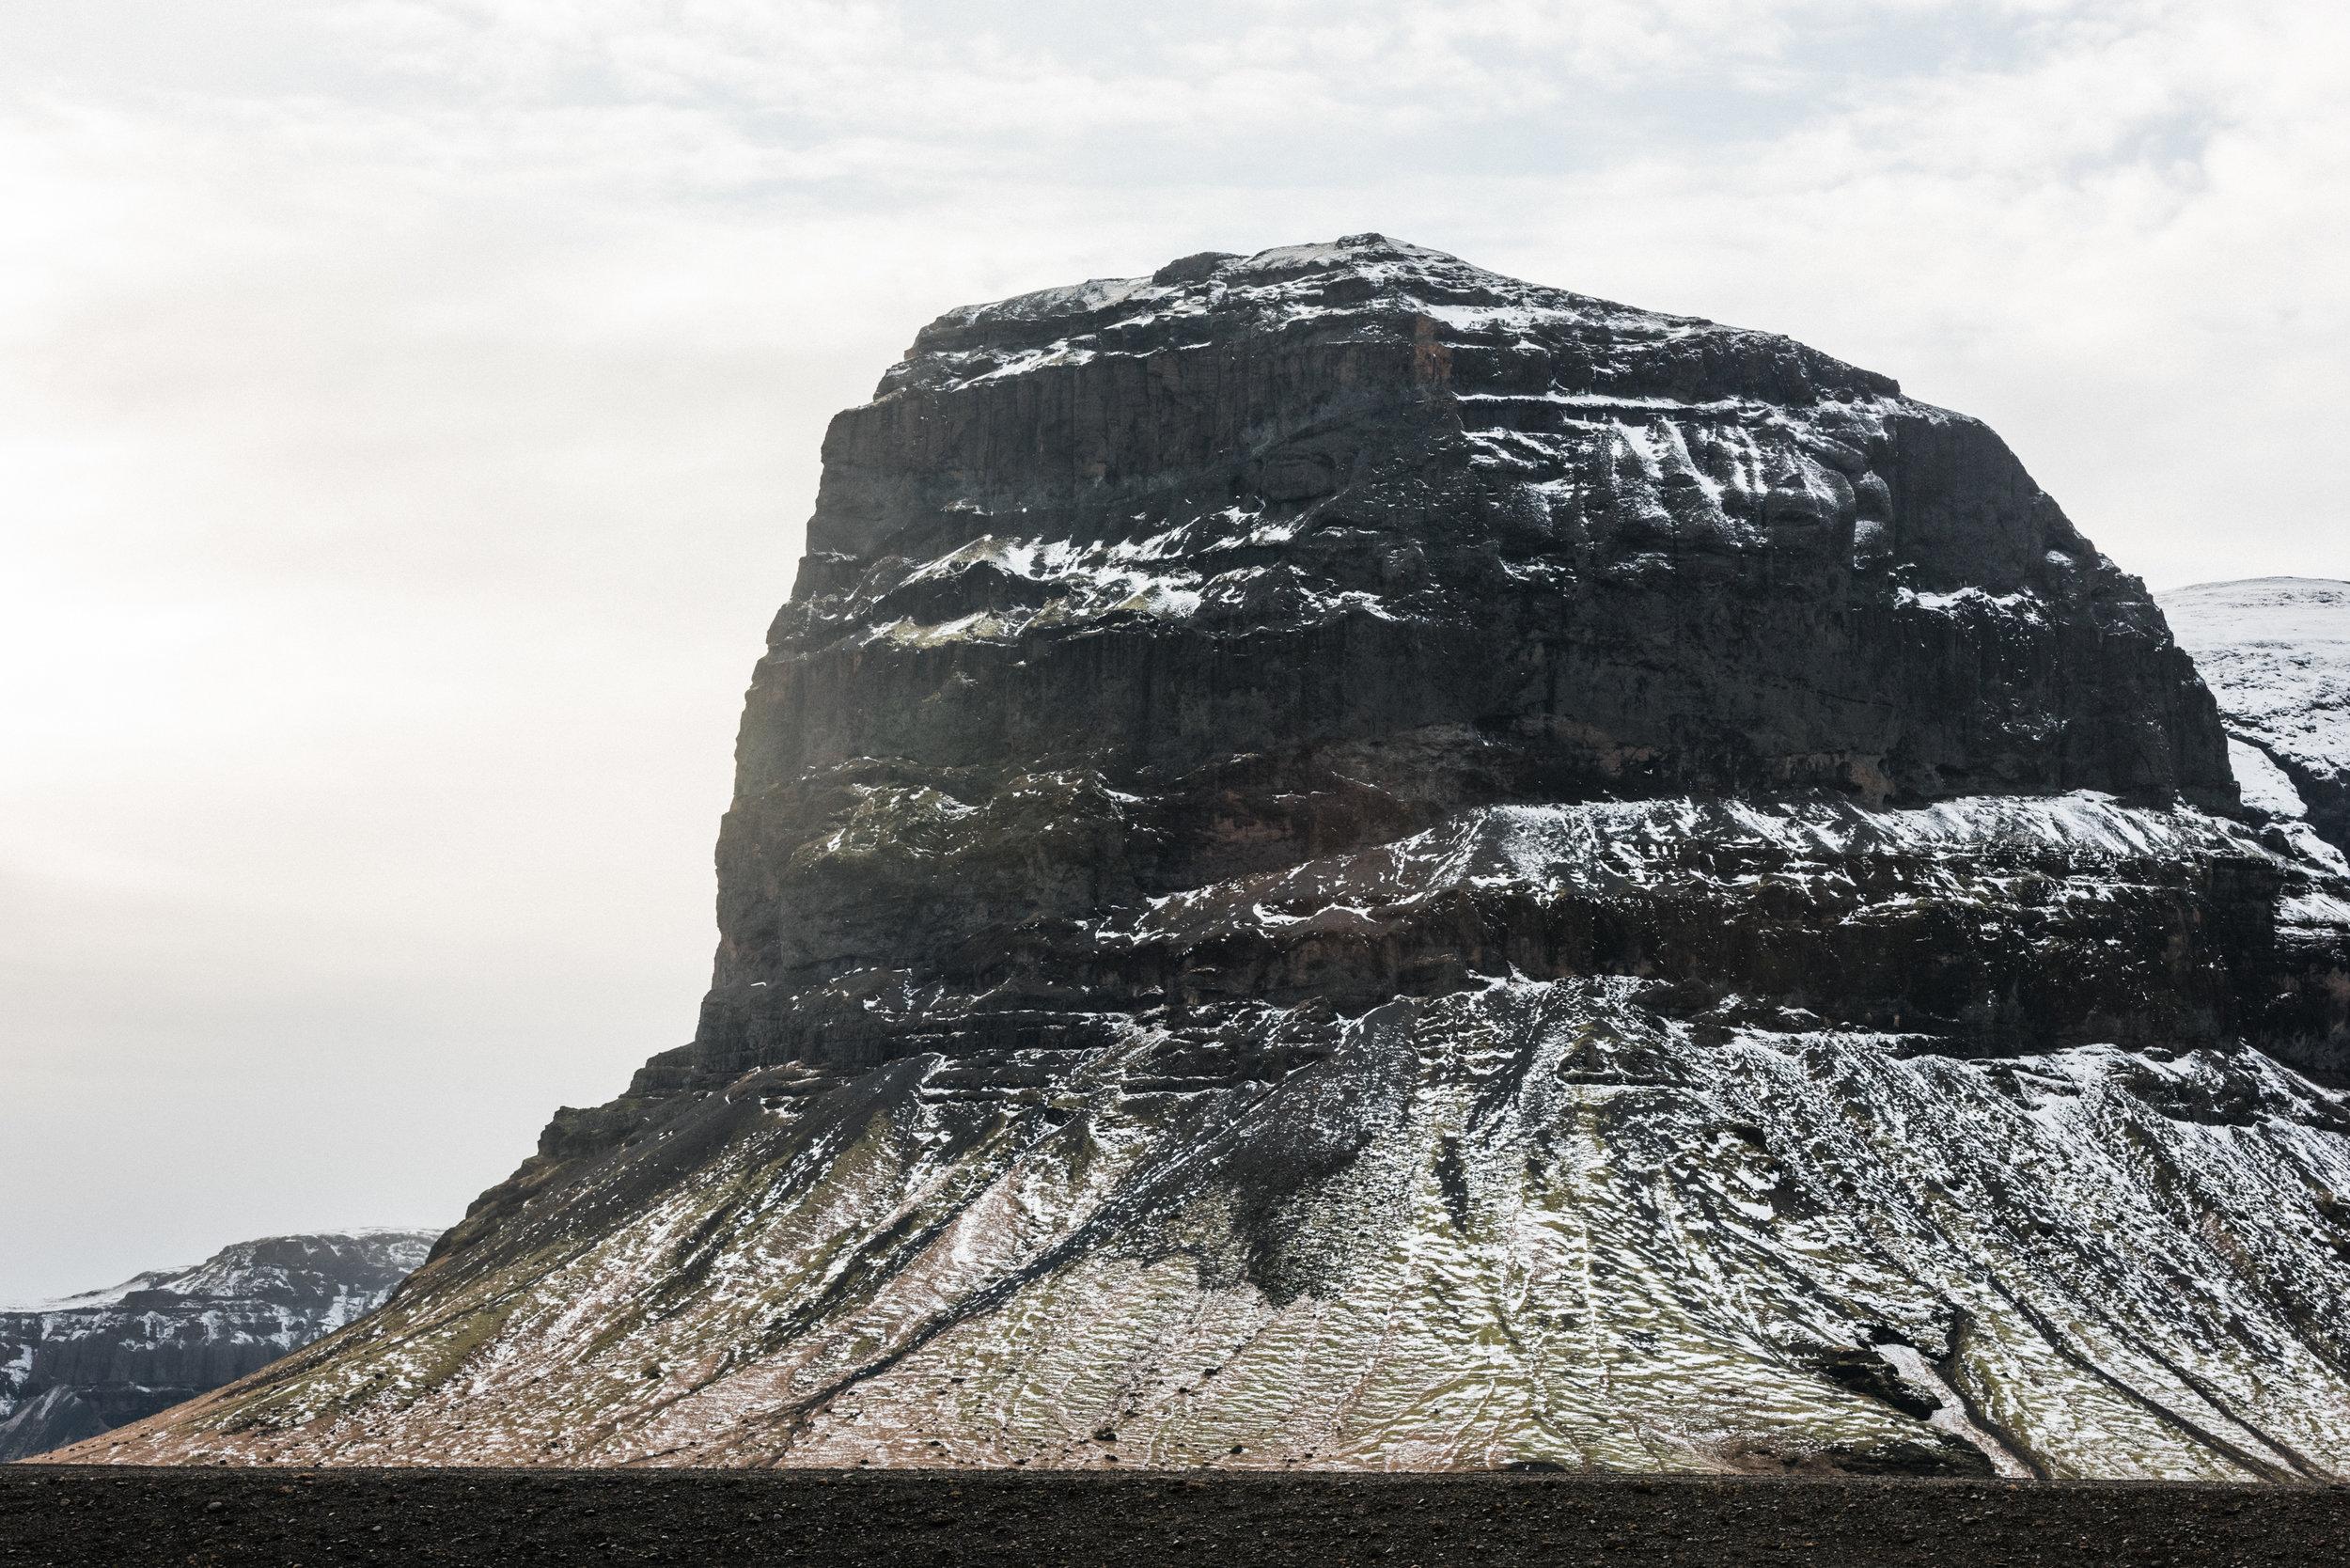 ICELAND_WOMAN_PHOTOGRAPHER_TARASHUPE_OUTDOOR_PHOTOGRAPHY_126.jpg